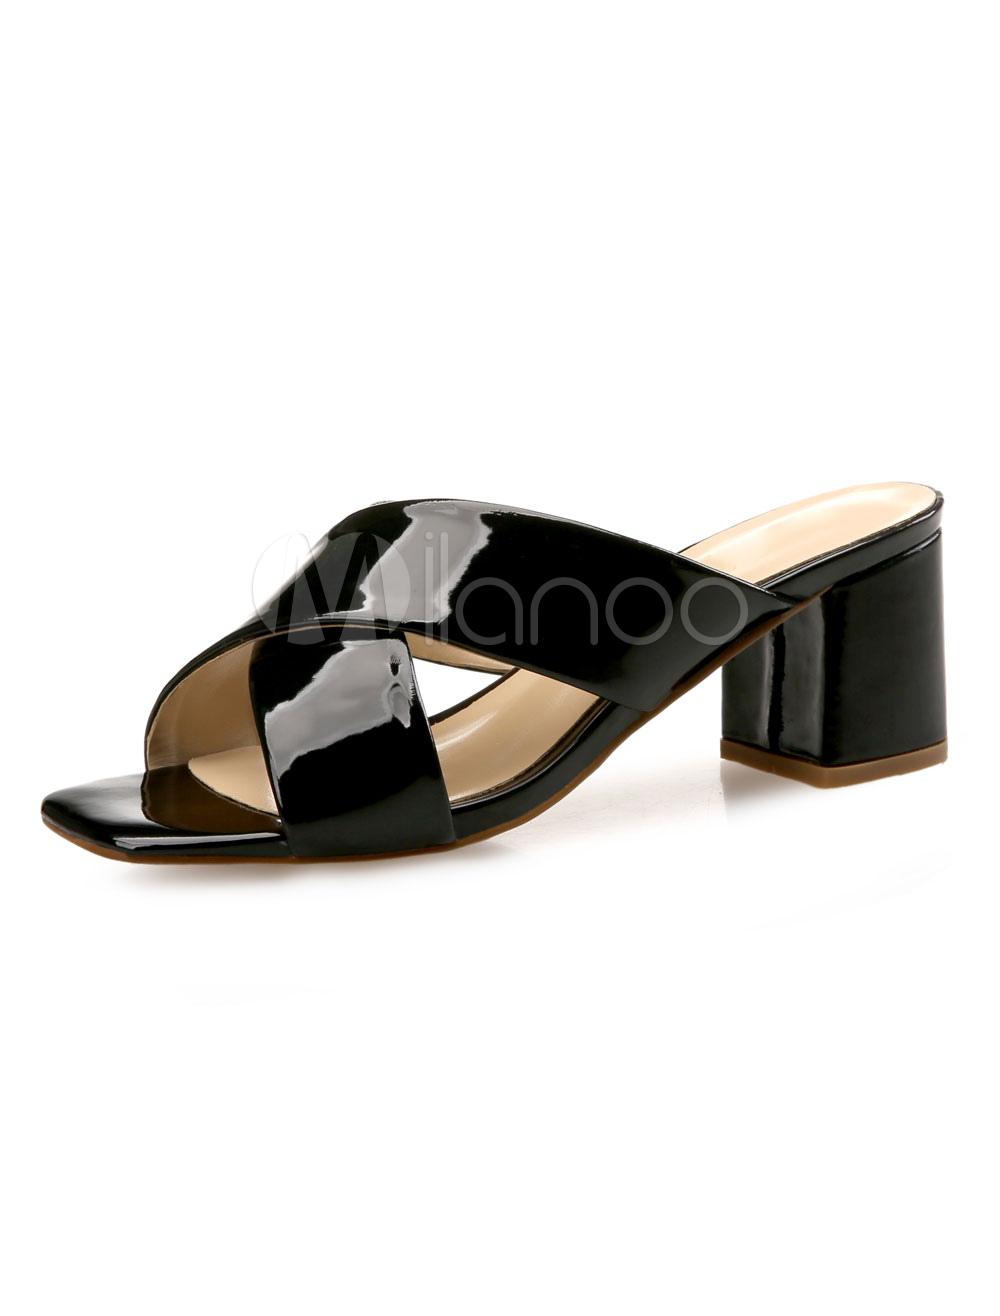 14a05ba167a Black Sandal Slippers Women Shoes Open Toe Chunky Heel Slide Sandals-No.1  ...